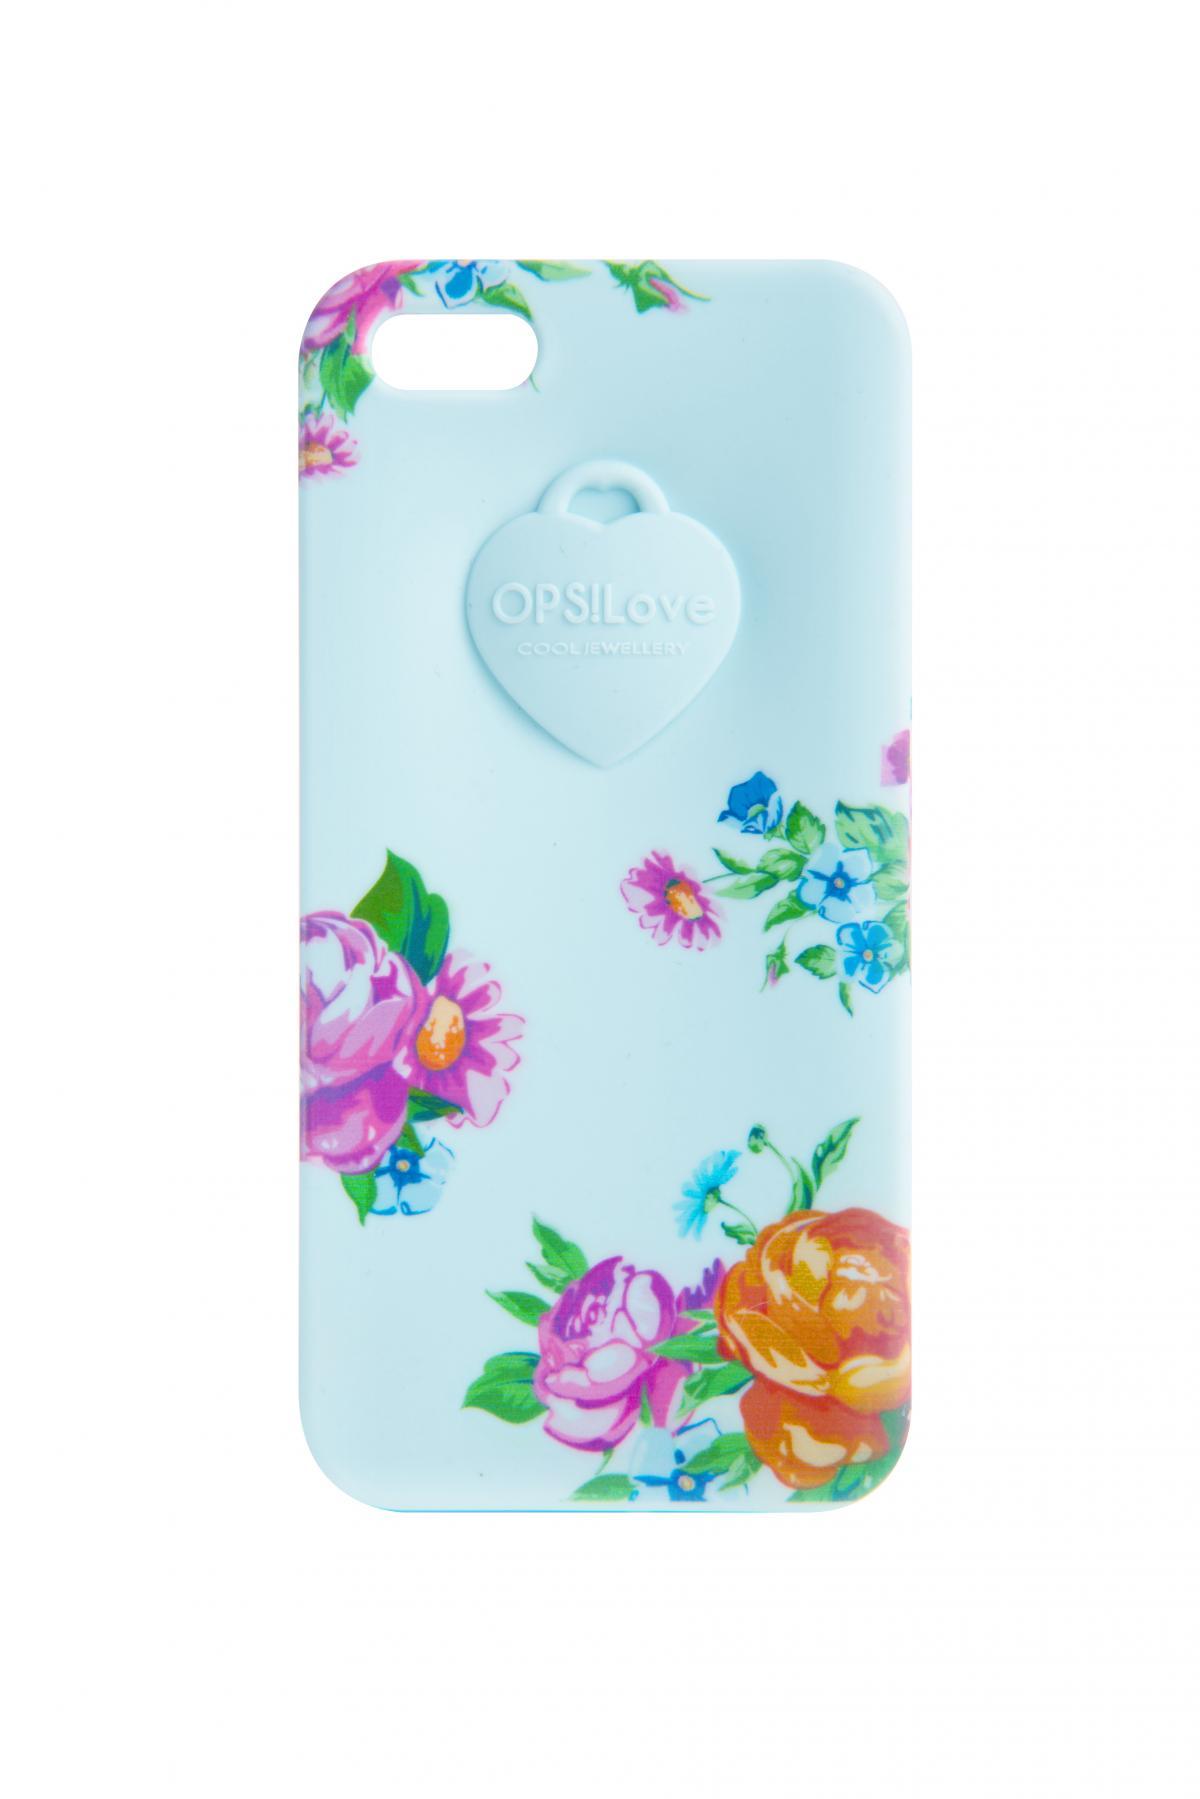 Cover ops-azzurra-flower-Clessidra Jewels